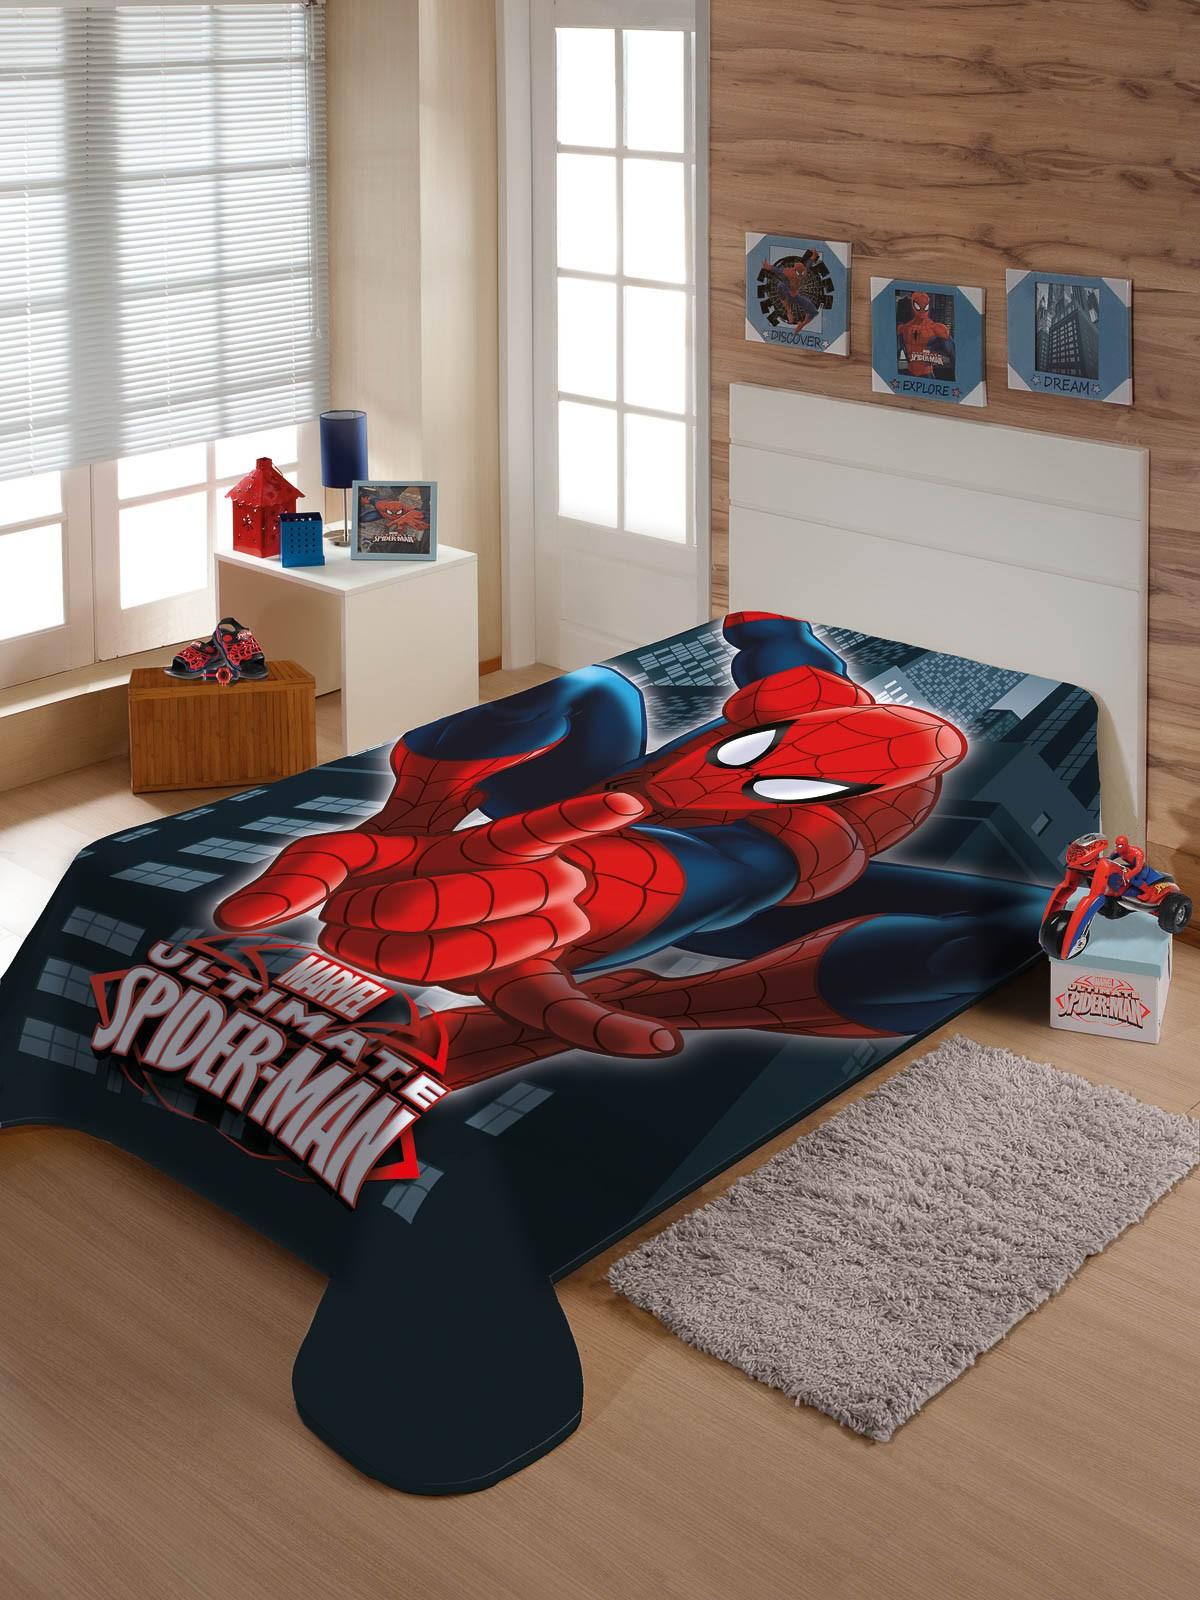 Cobertor Juvenil Jolitex Solteiro 1,50x2,00m Homem Aranha